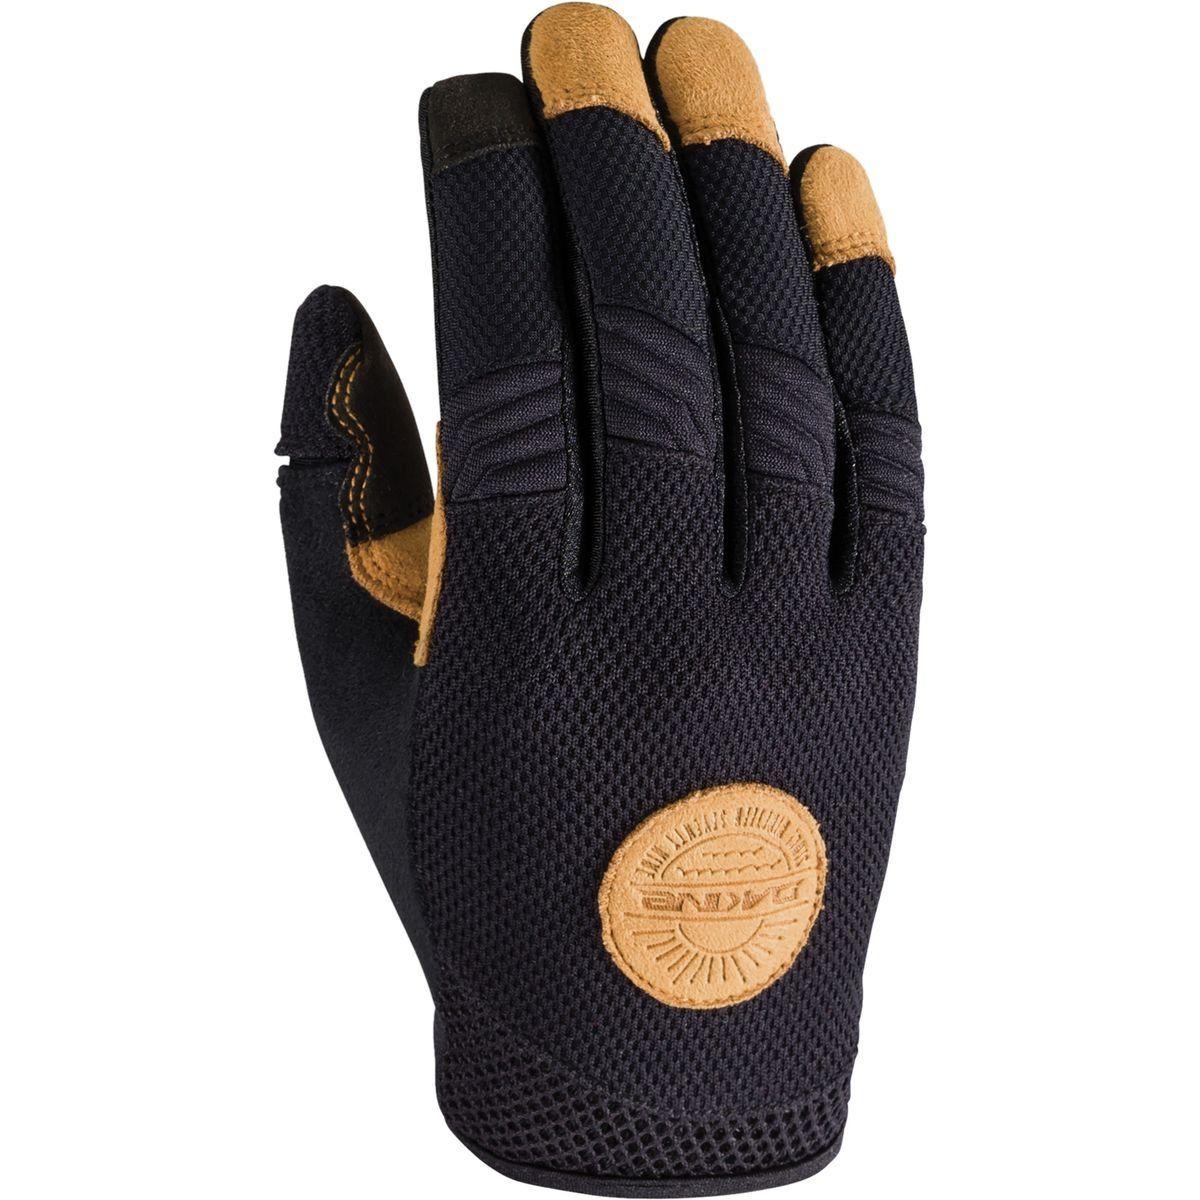 20 inch ebike Gloves Electric Bike Gloves for Adults Bike Sports Gloves for Men Women